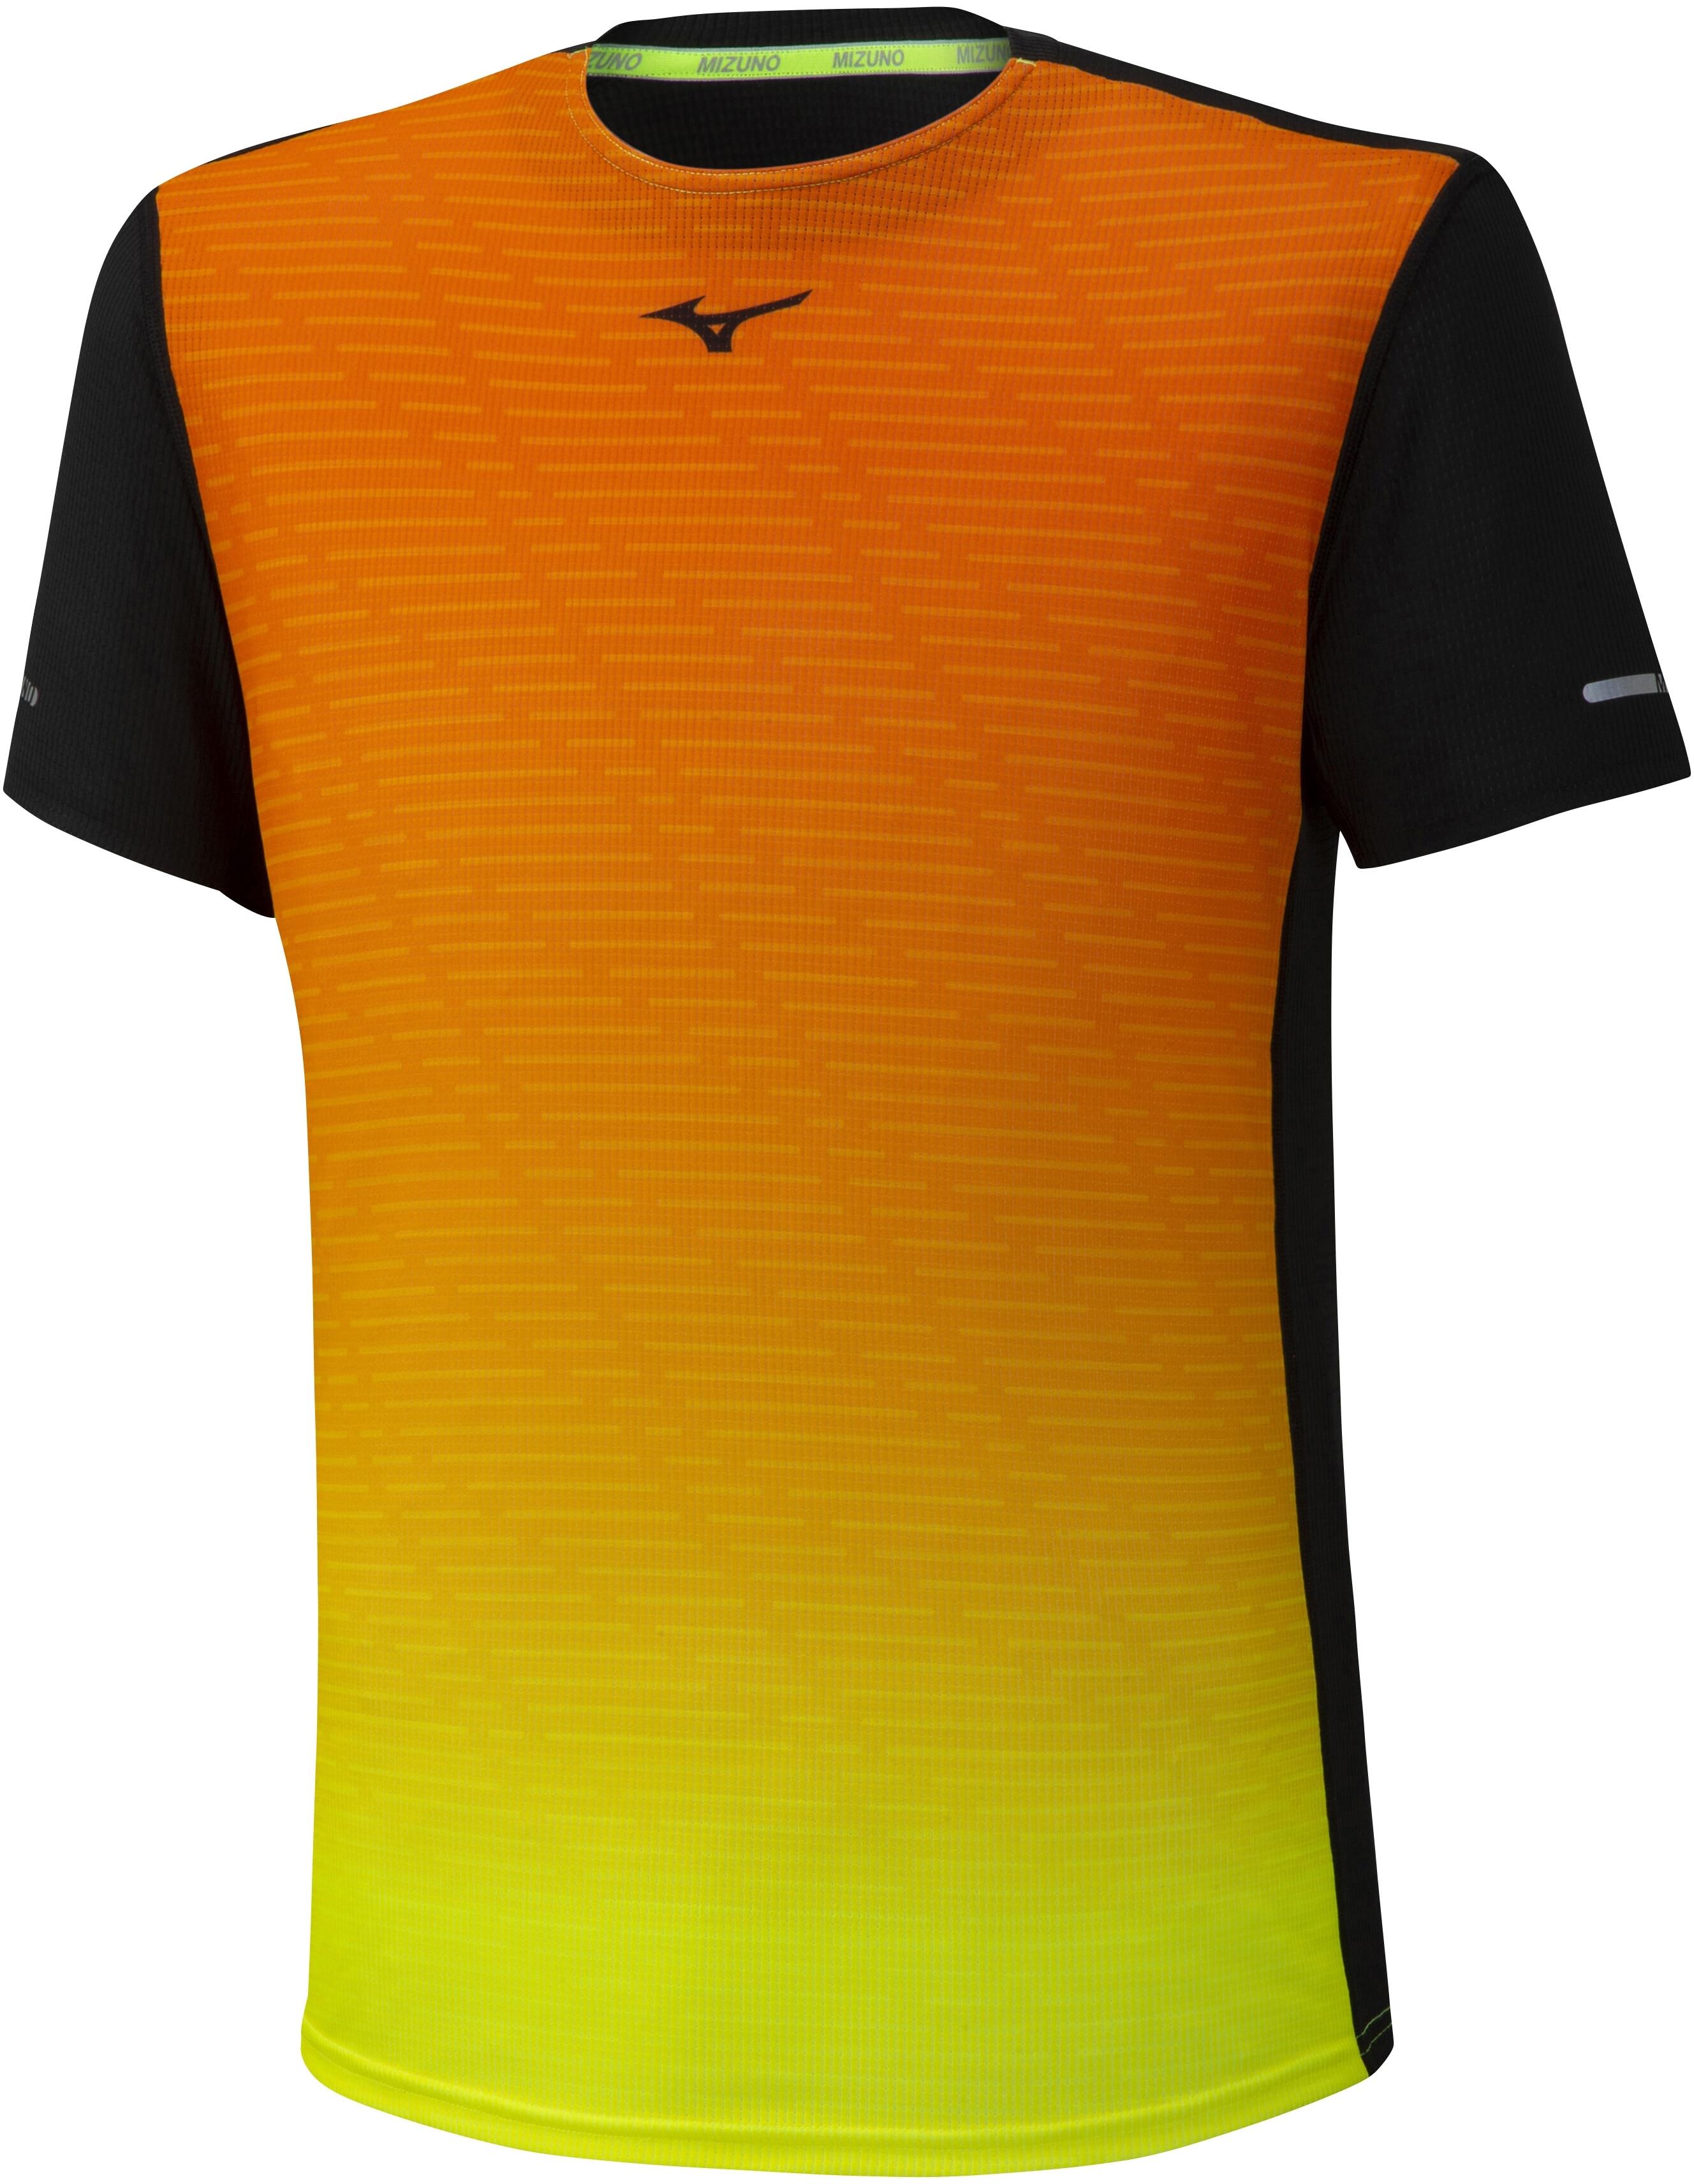 Mizuno Aero Manches Longues T-Shirt